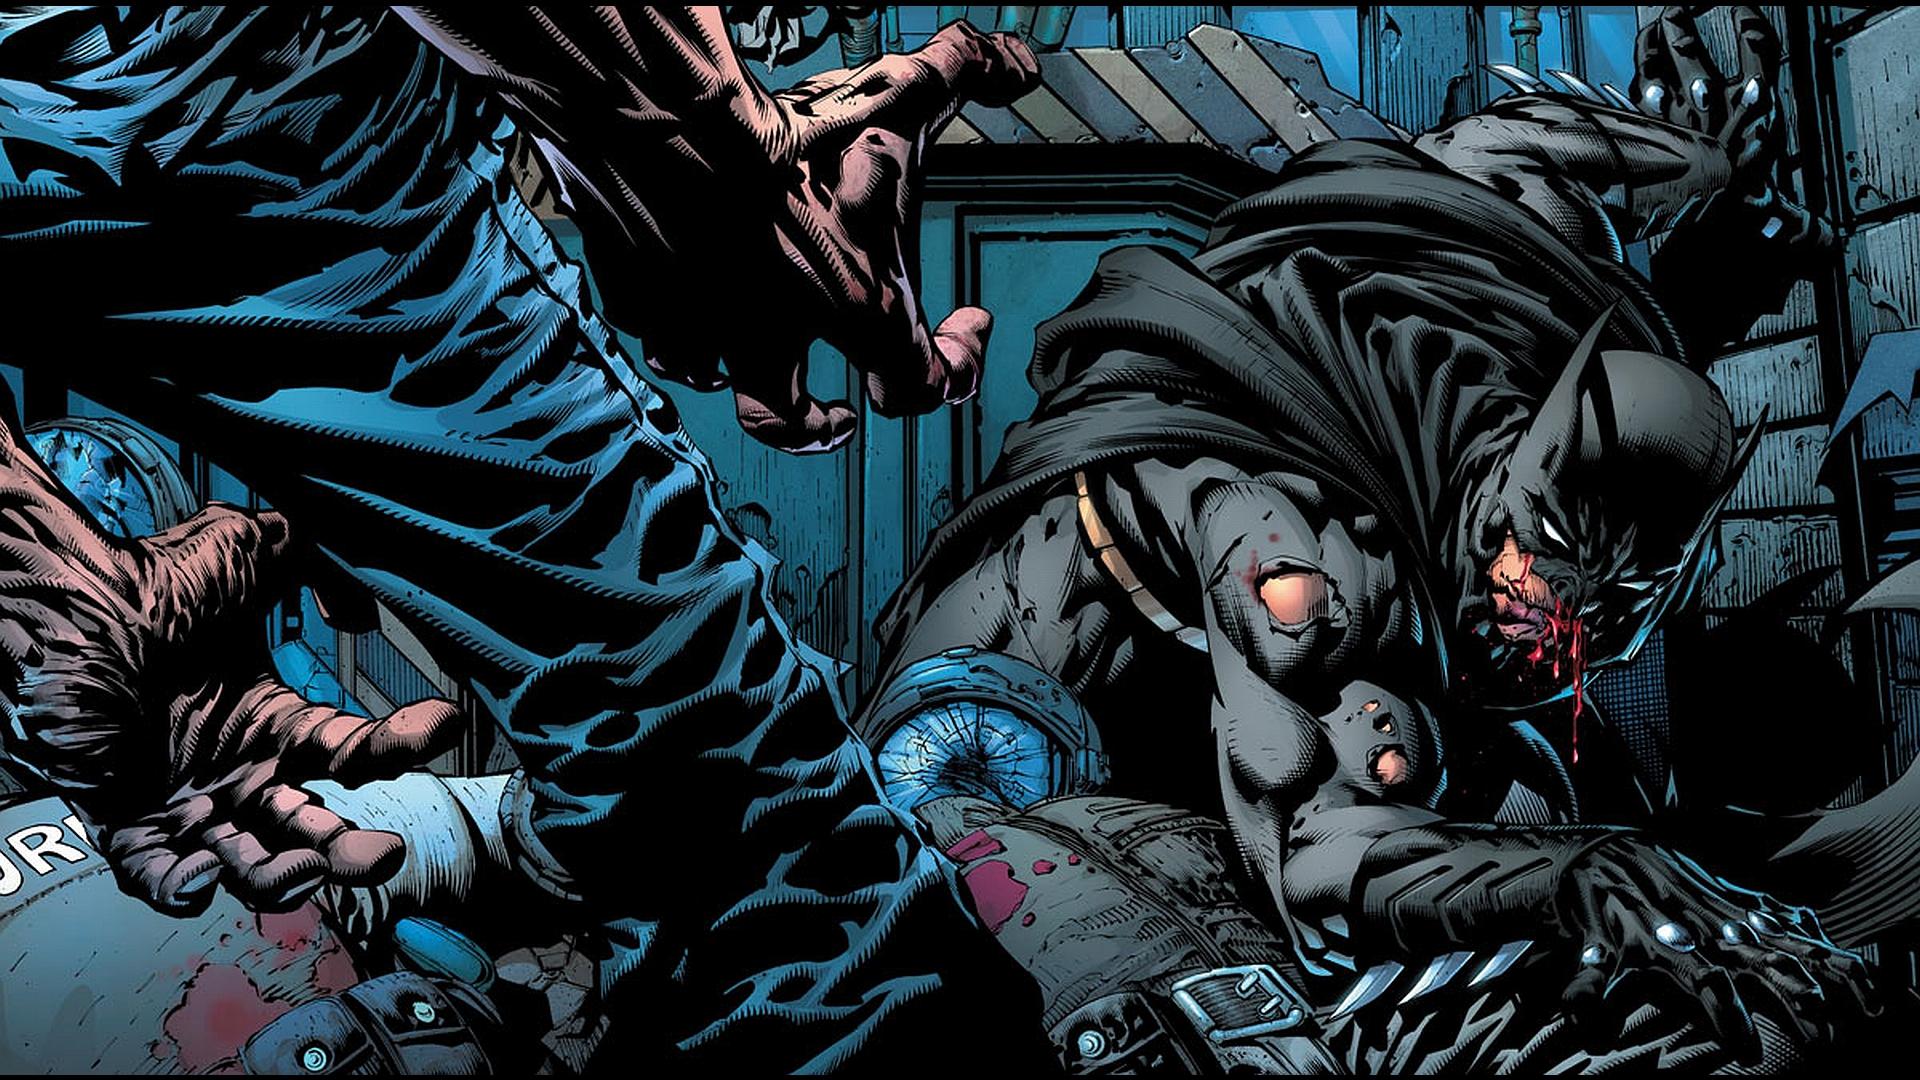 Batman Comic Book Wallpaper 1024x768 - WallpaperSafari Batman Comic Cover Wallpaper